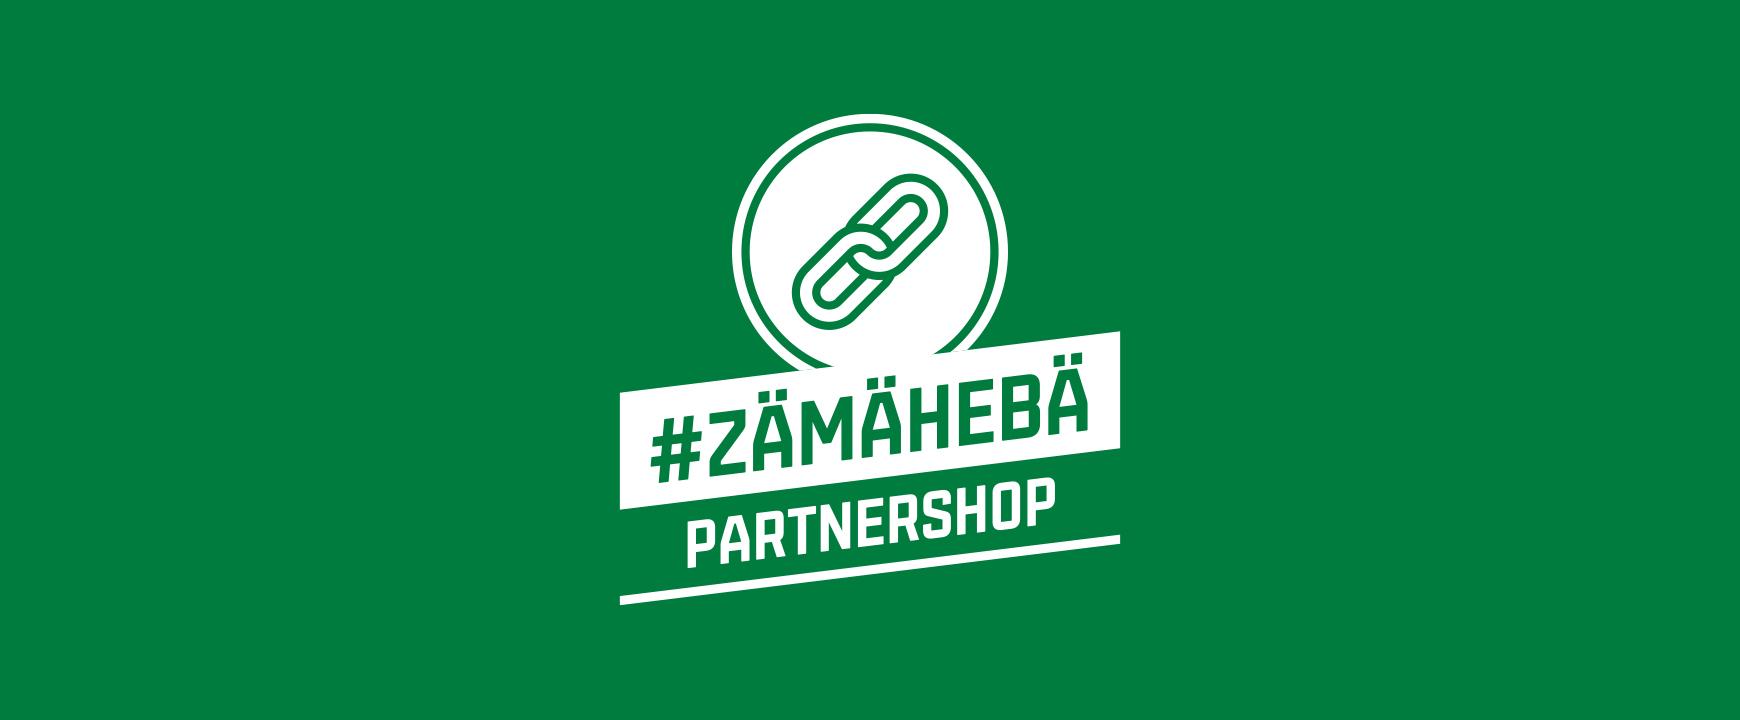 Partnershop